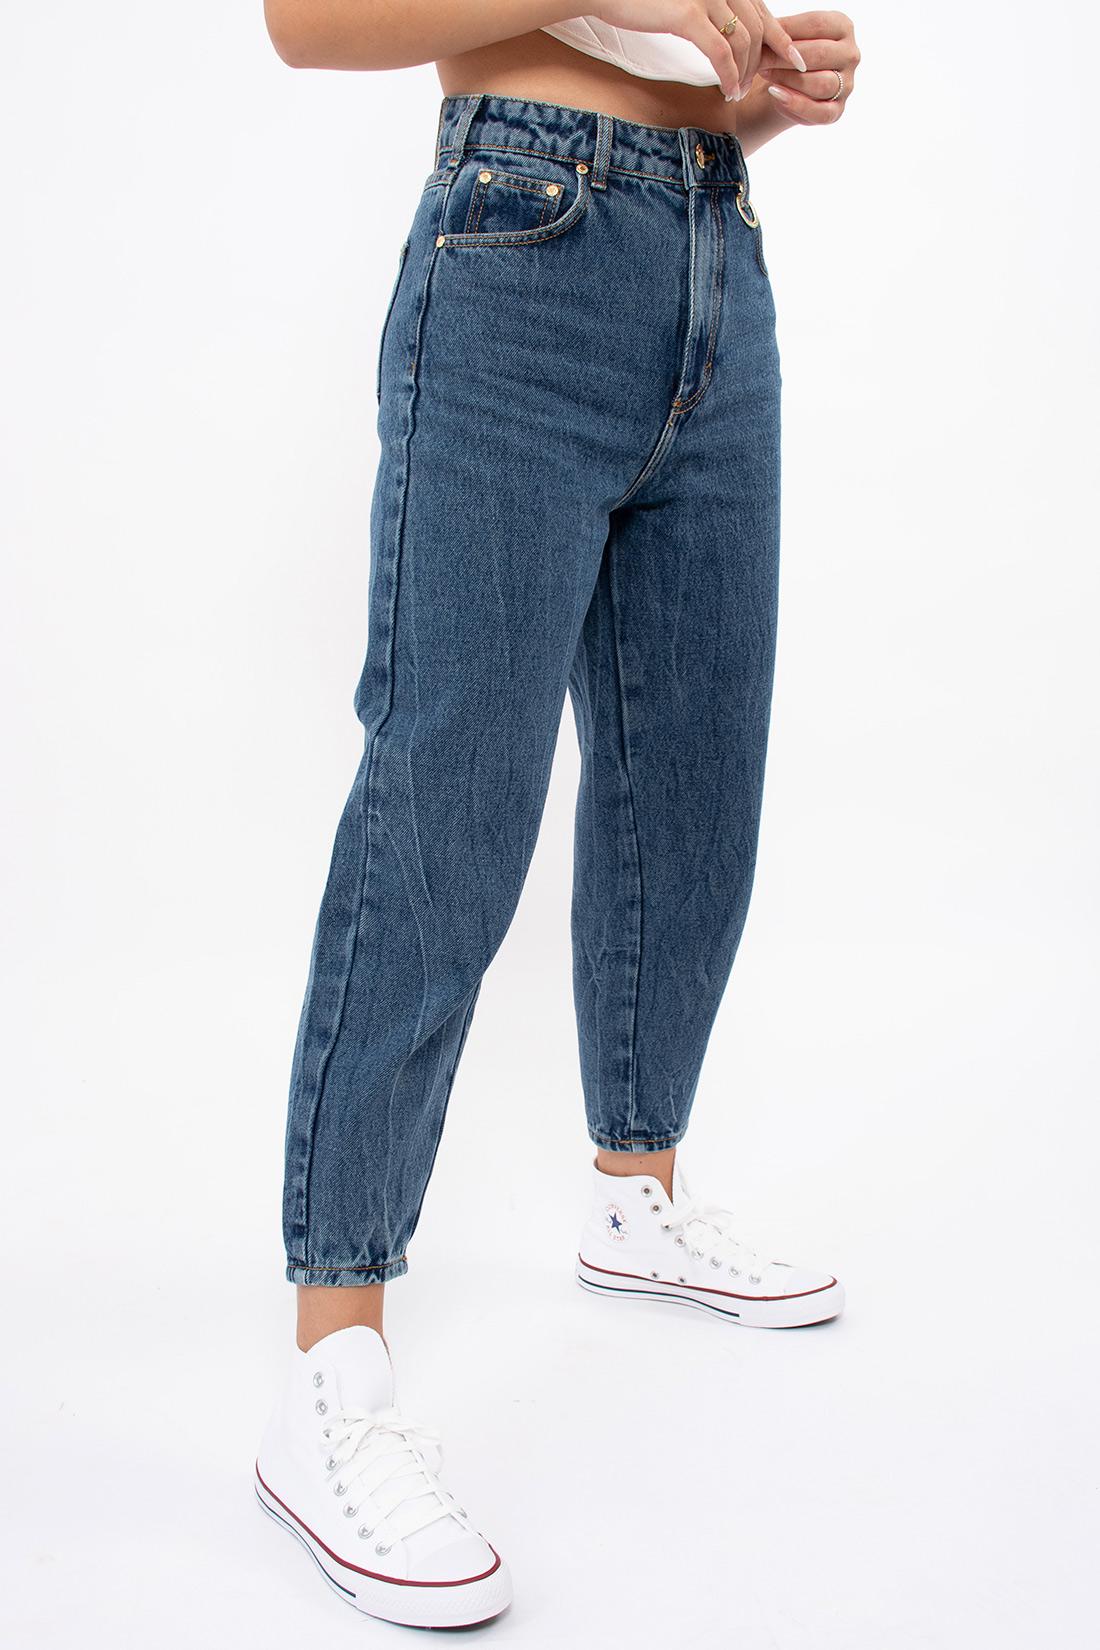 Calca Jeans Sommer Luiza Mom